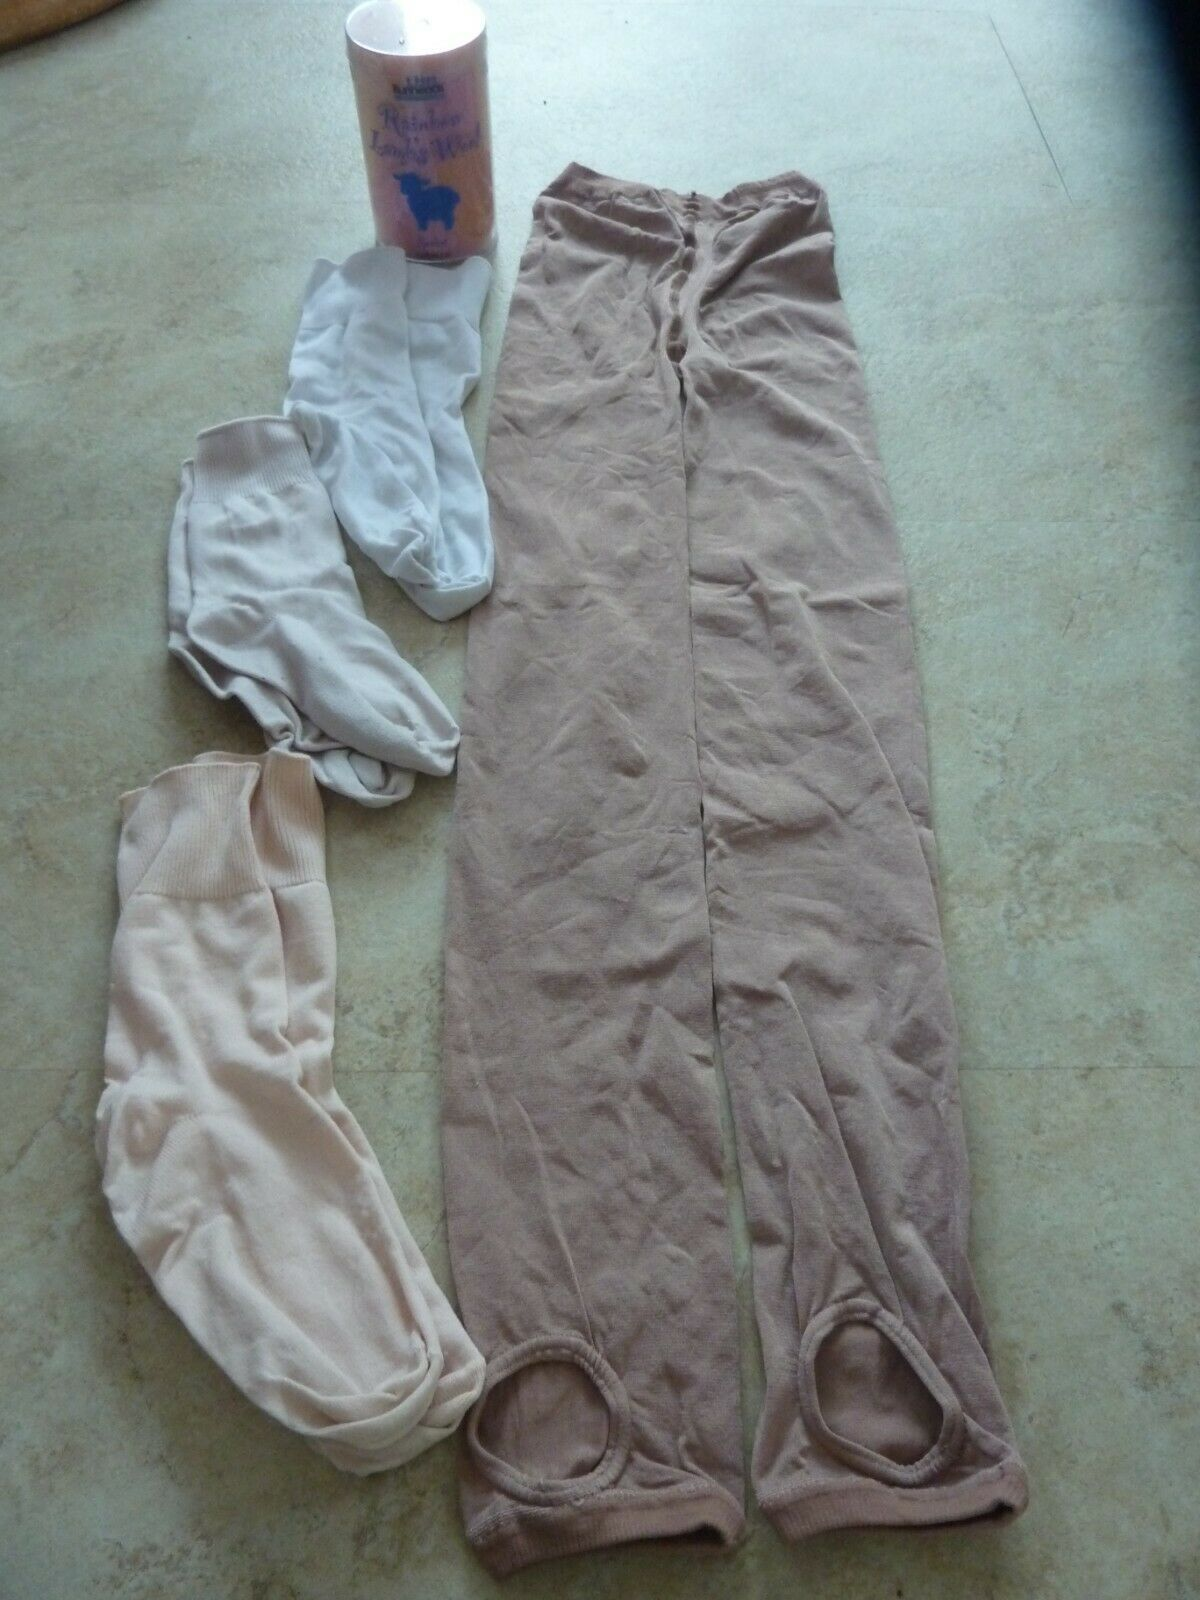 Kid ballet socks, stirrup shimmer tan tights and rainbow lamb wool